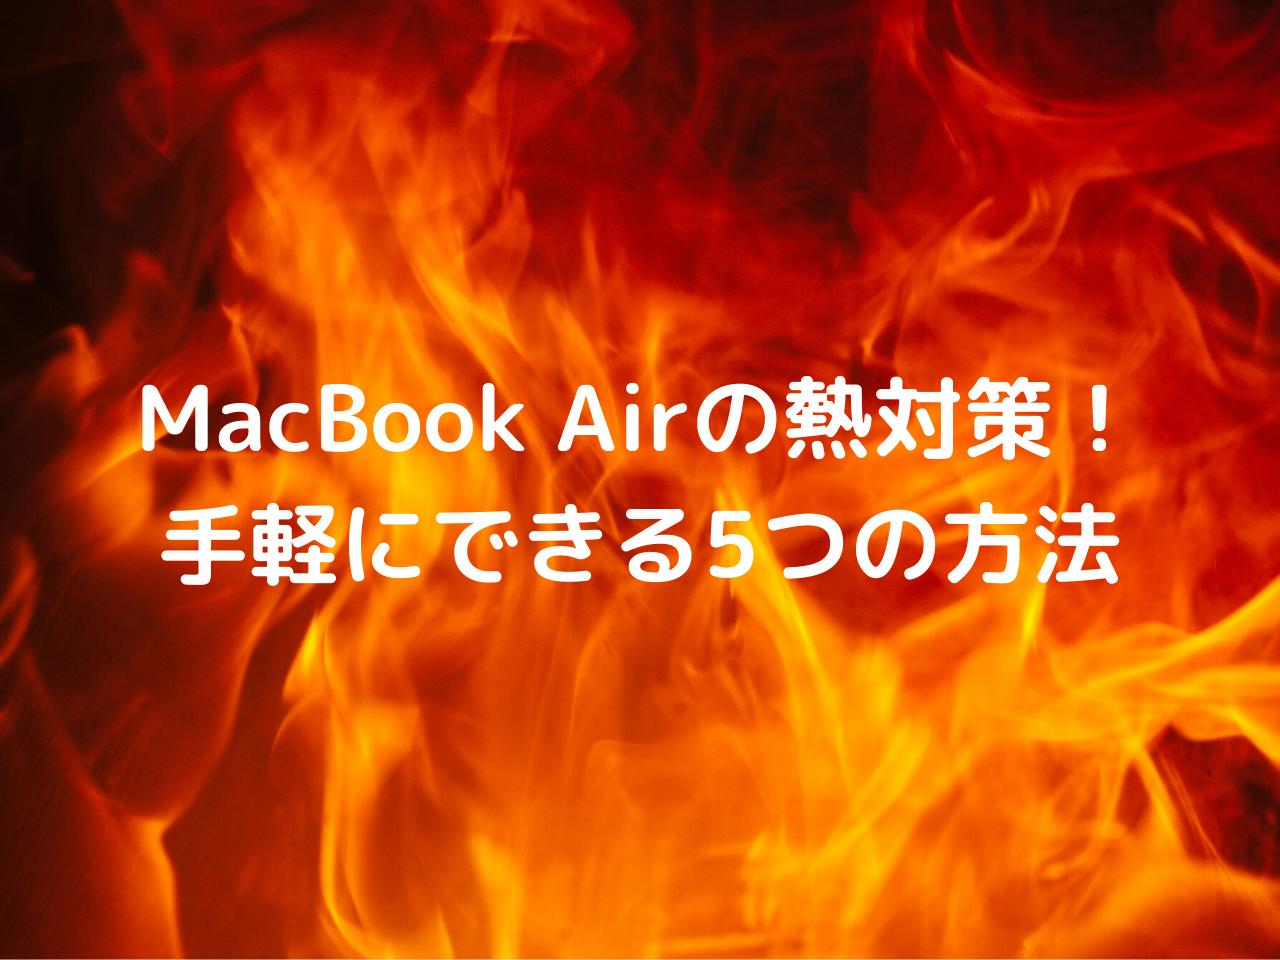 MacBook Airの熱対策、手軽にできる5つの方法